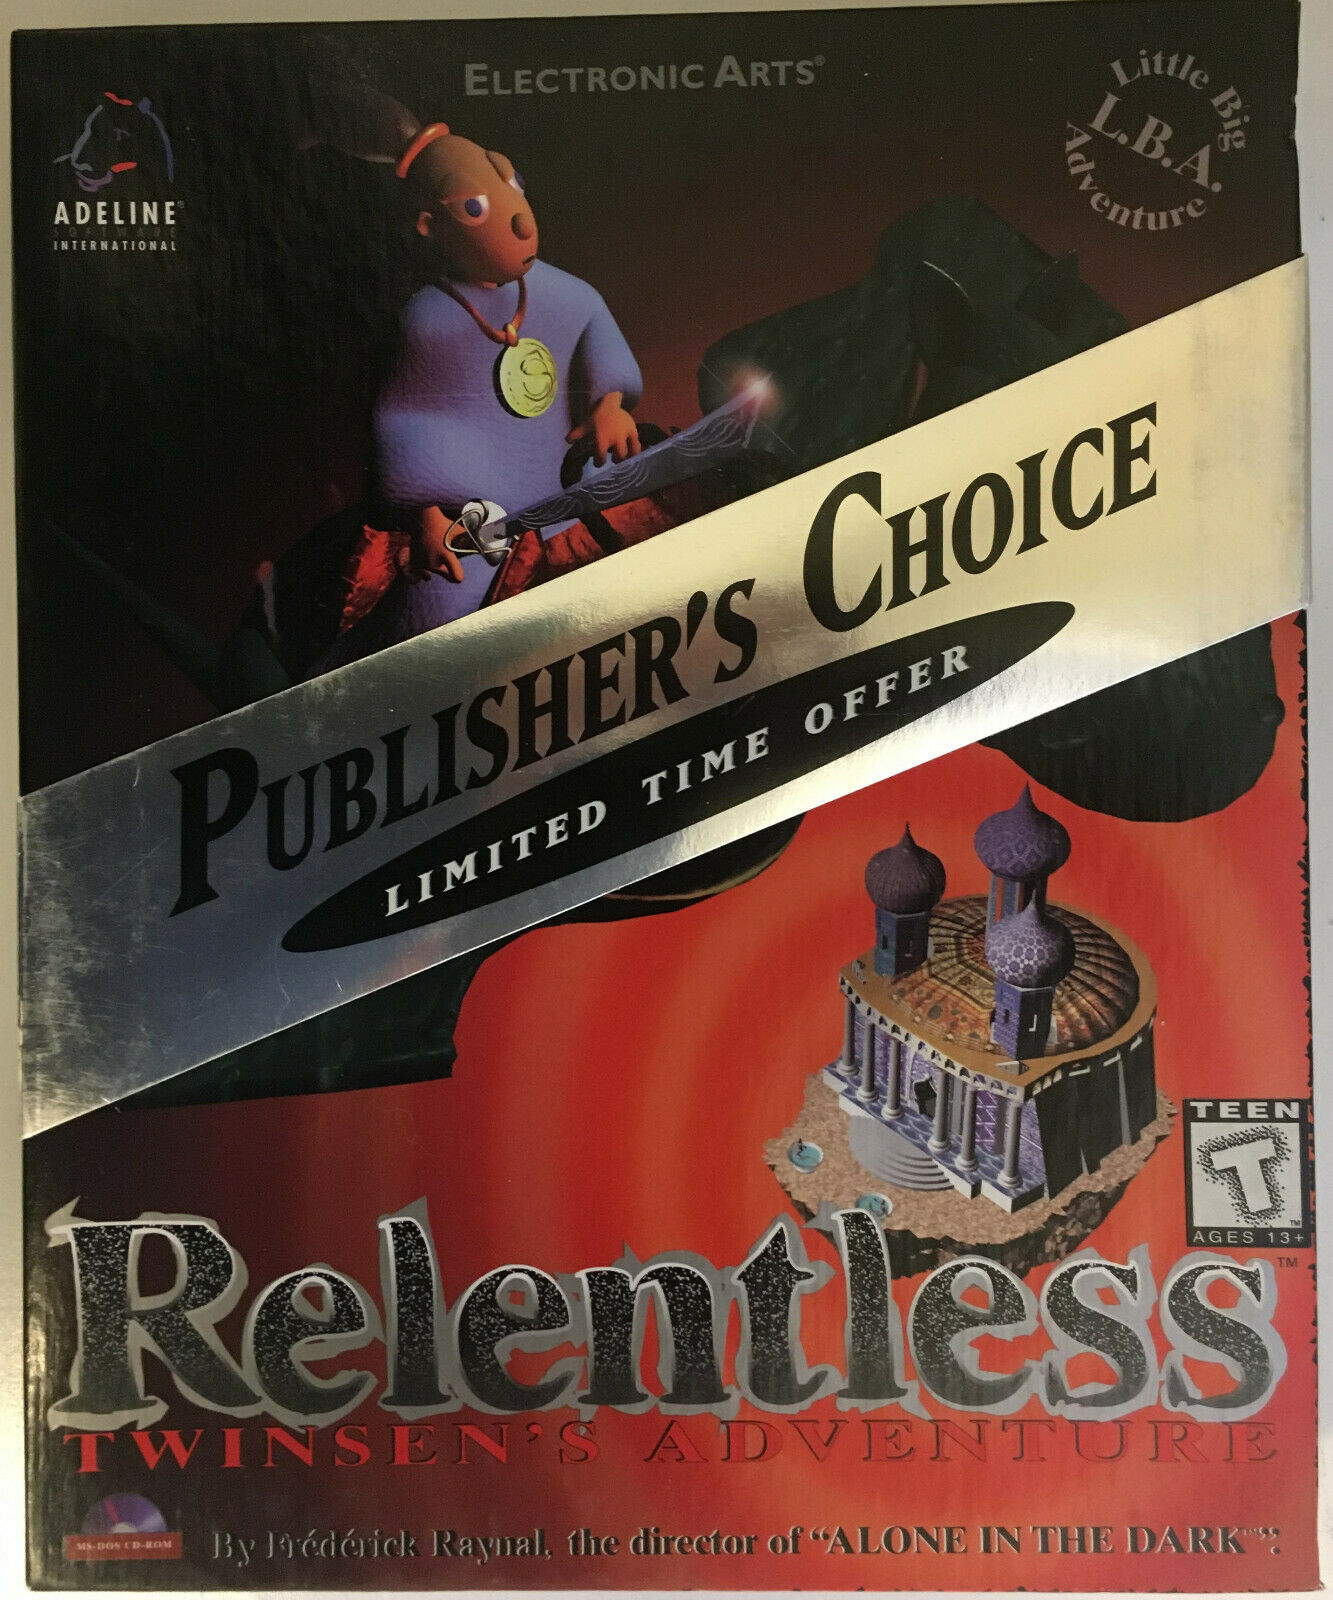 Relentless: Twinsen's Adventure (PC, 1994)